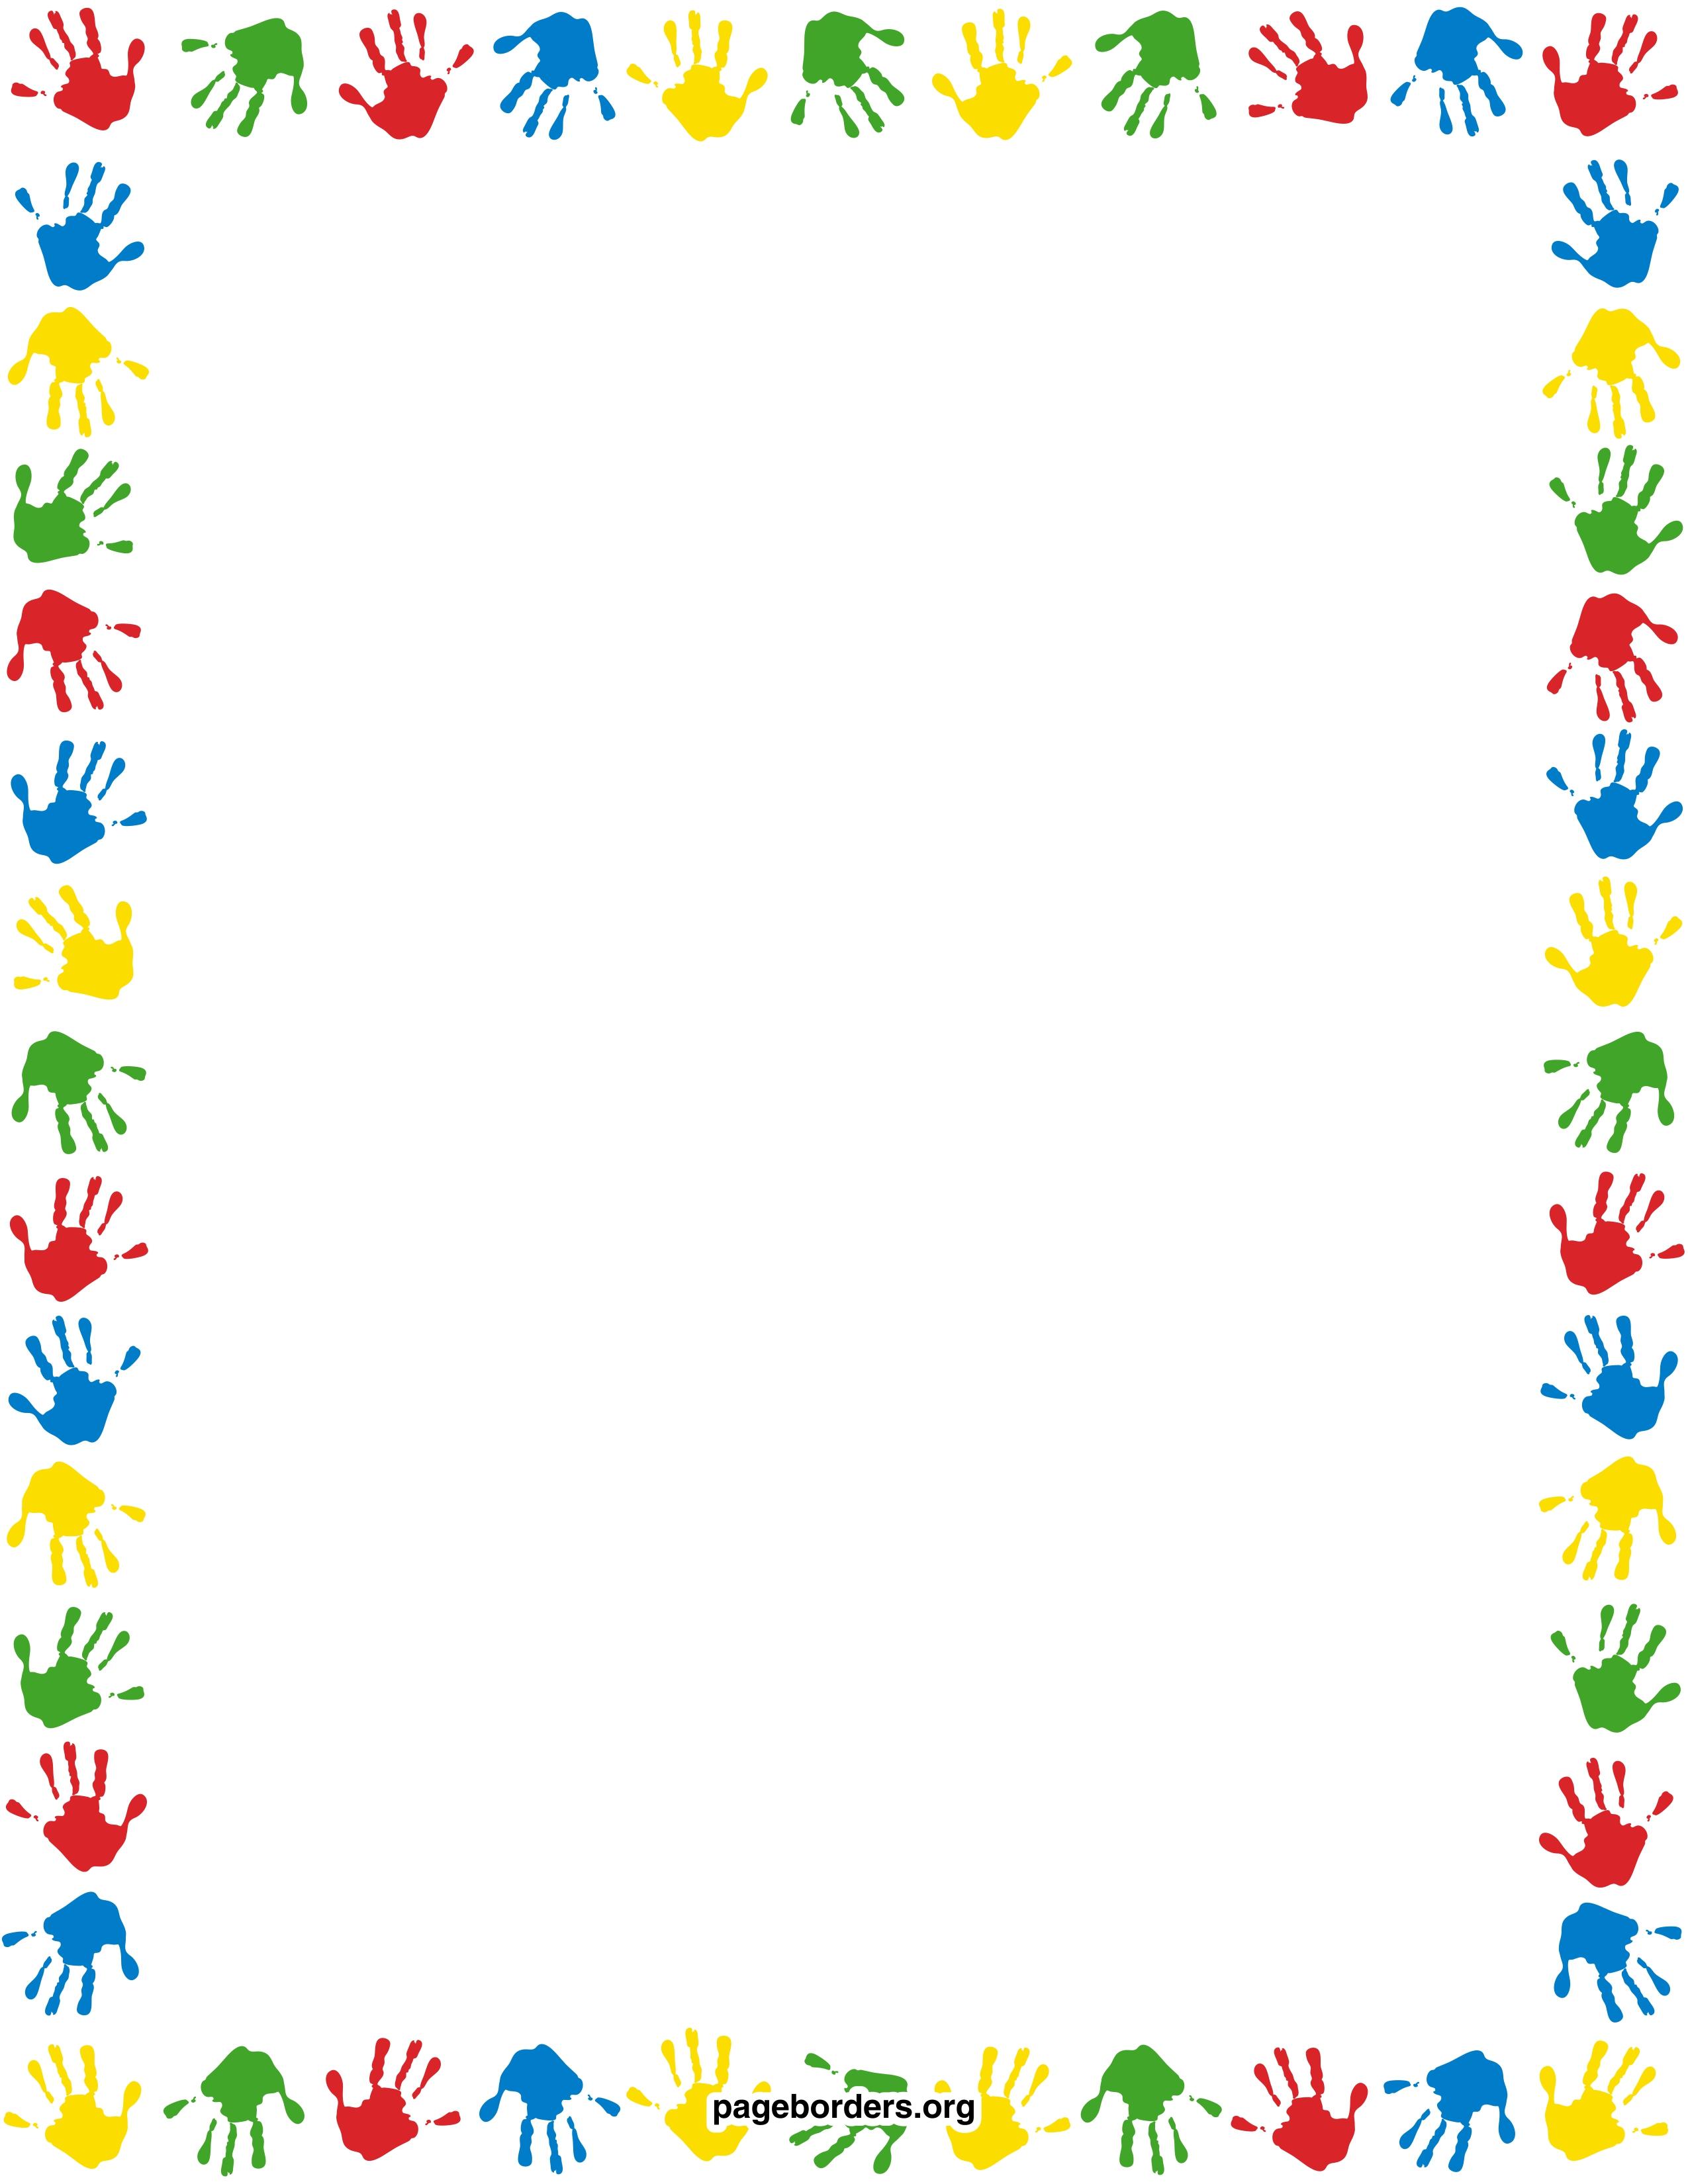 Printable children border. Free GIF, JPG, PDF, and PNG downloads.